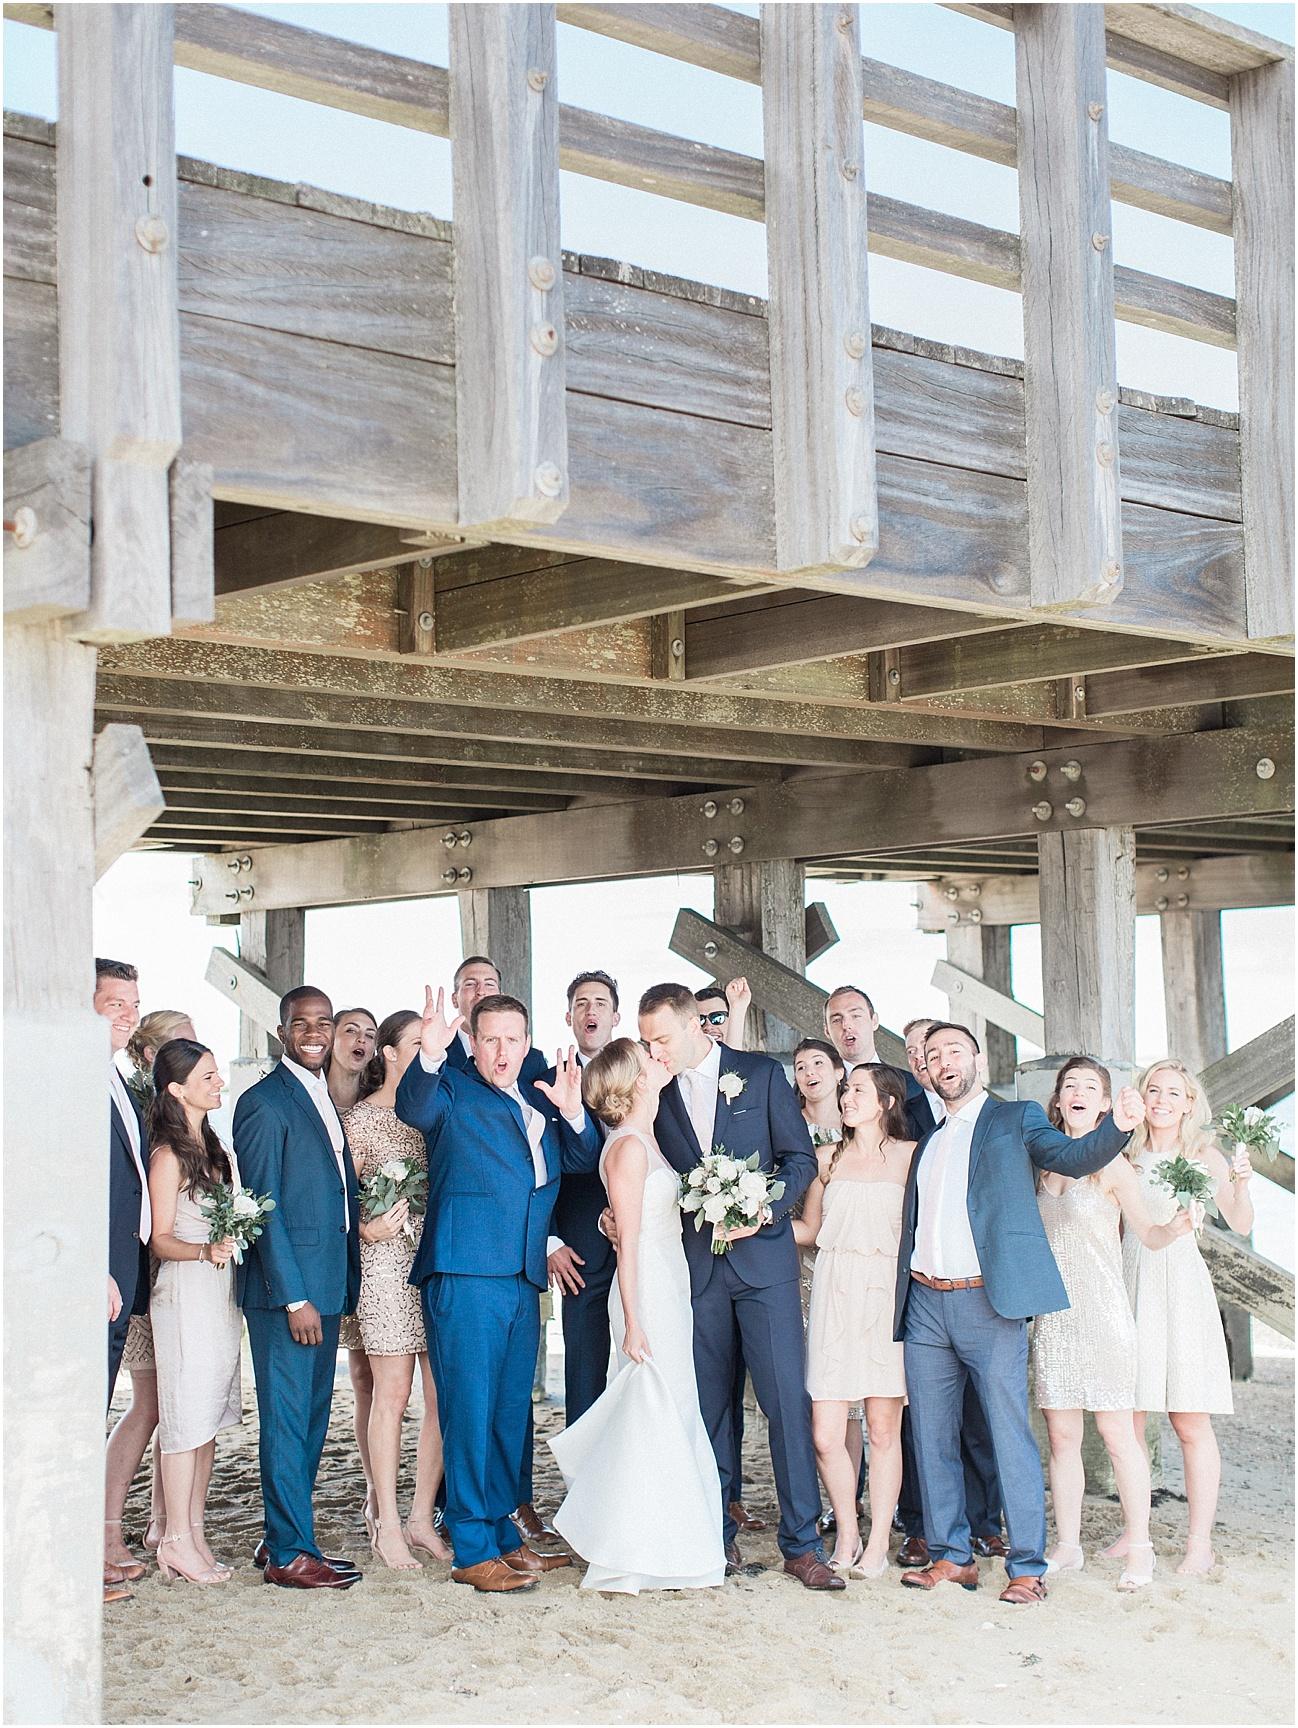 claire_gordon_duxbury_bay_maritime_school_beach_dock_powder_point_bridge_cape_cod_boston_wedding_photographer_meredith_jane_photography_photo_0597.jpg